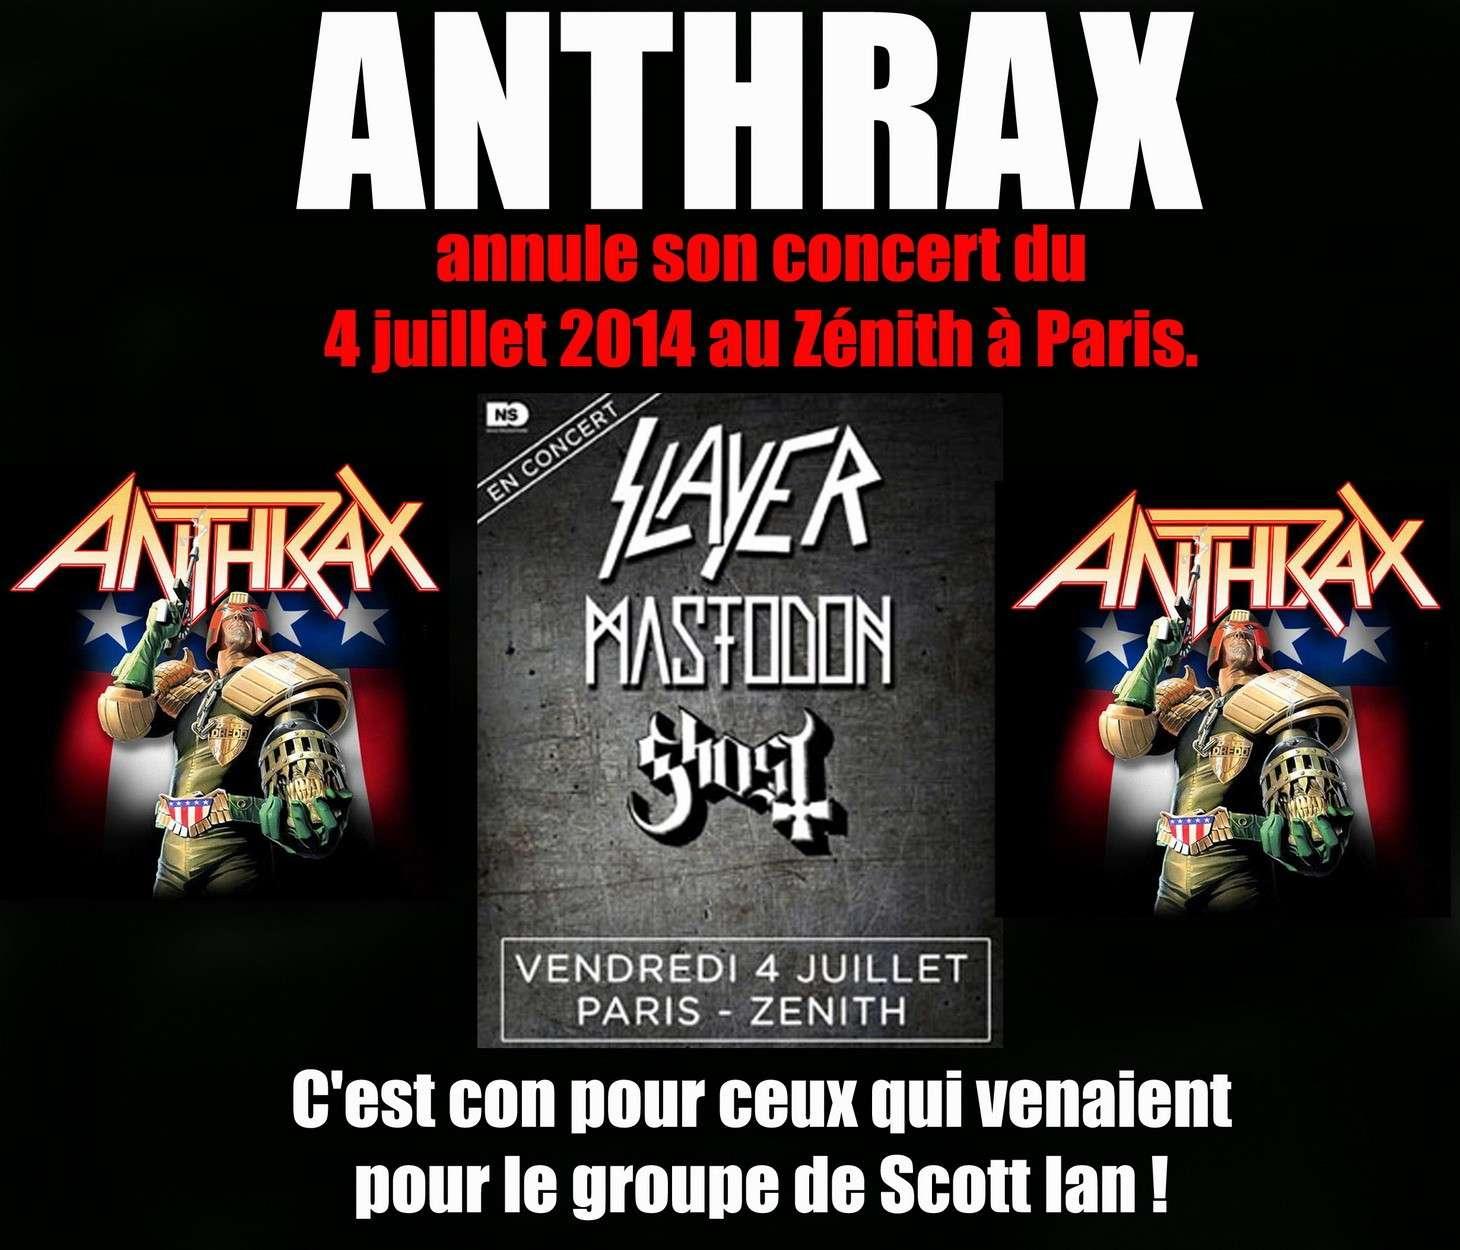 Les NEWS du METAL en VRAC ... - Page 5 Anthra12